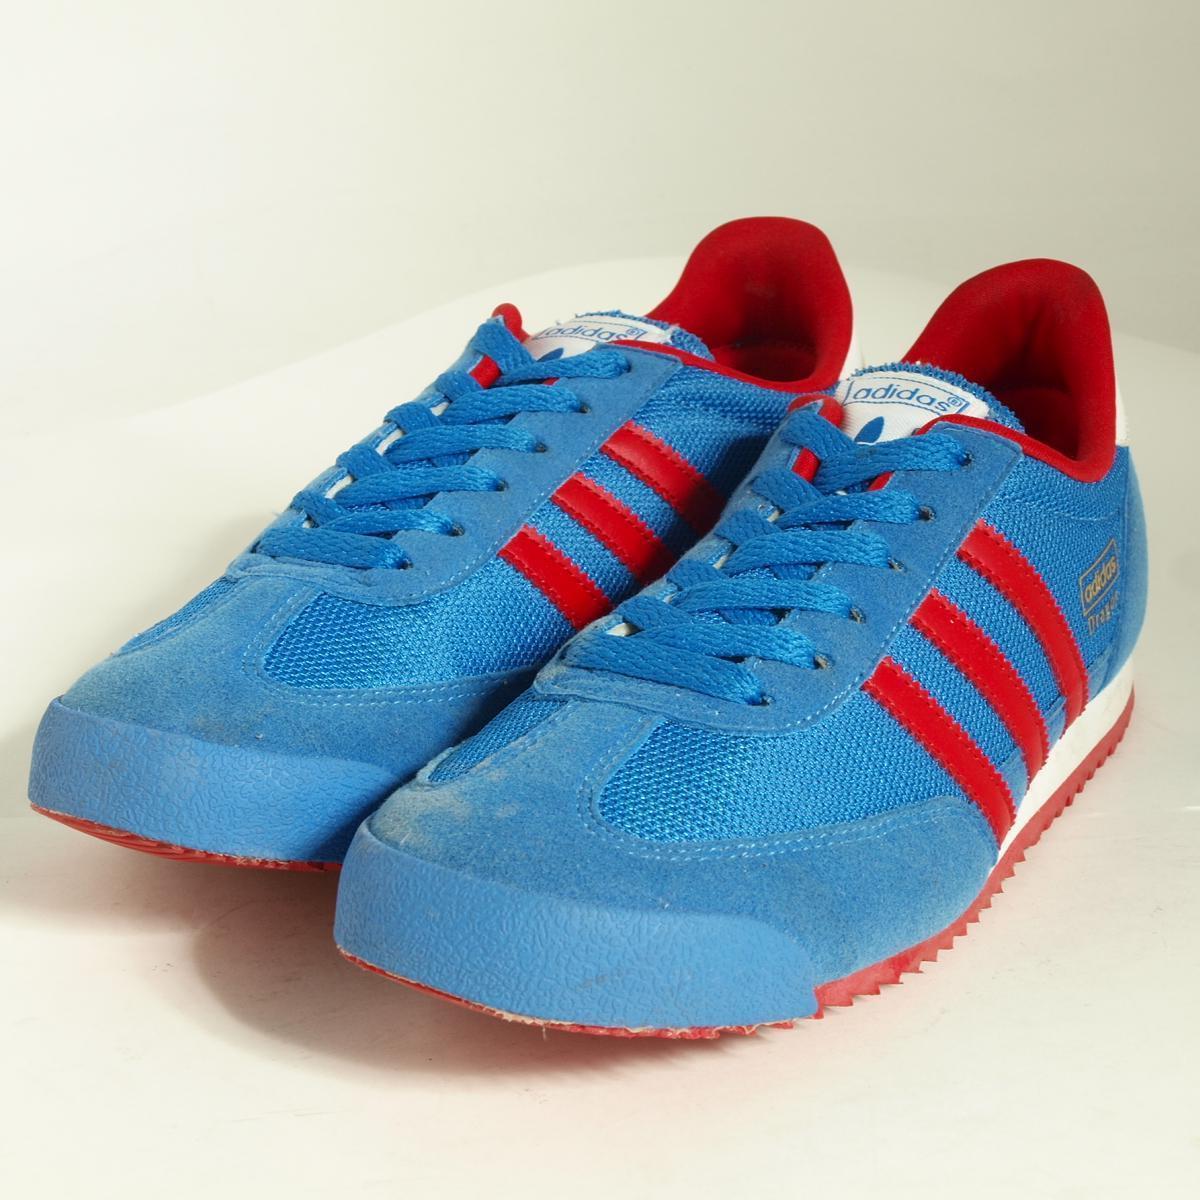 阿迪达斯DRAGON运动鞋US6女士23.5cm adidas/boj0717 160708